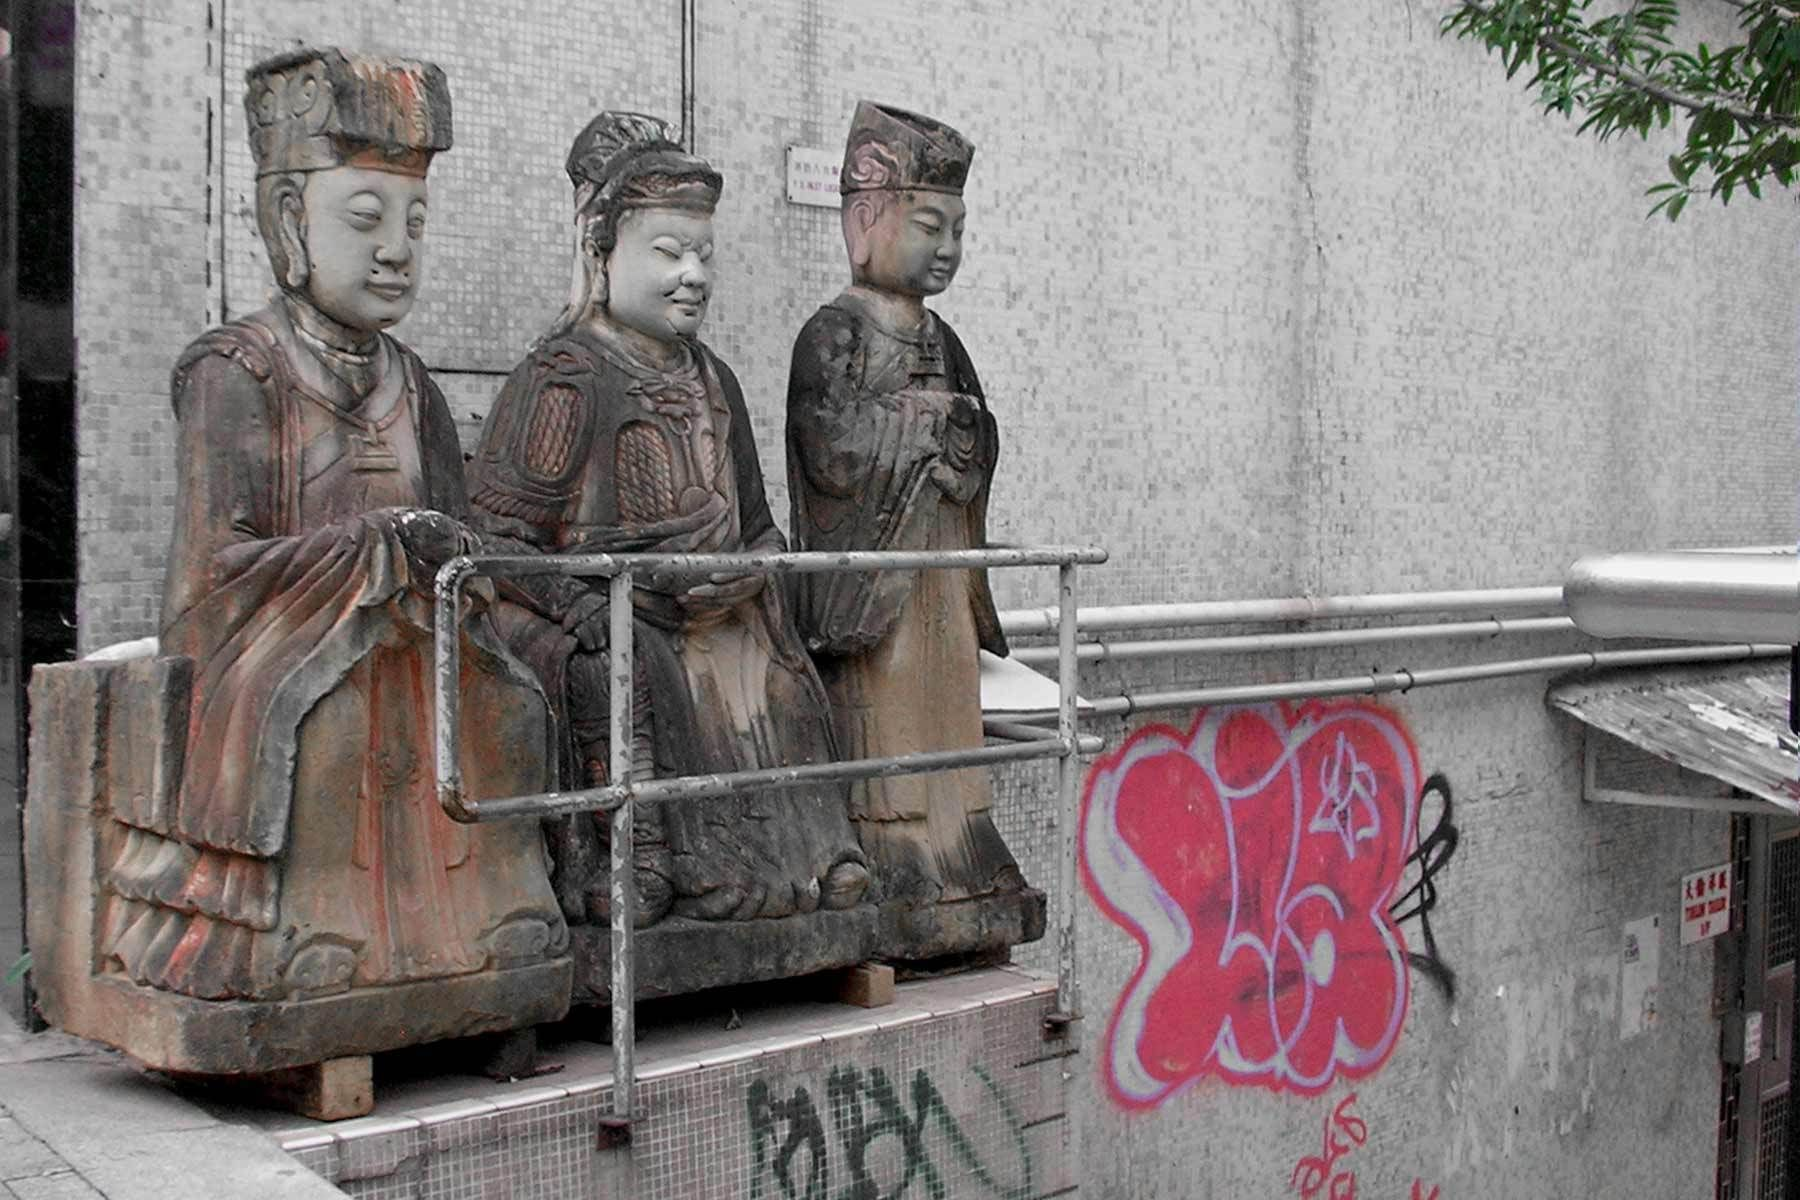 100___hk___guards.jpg